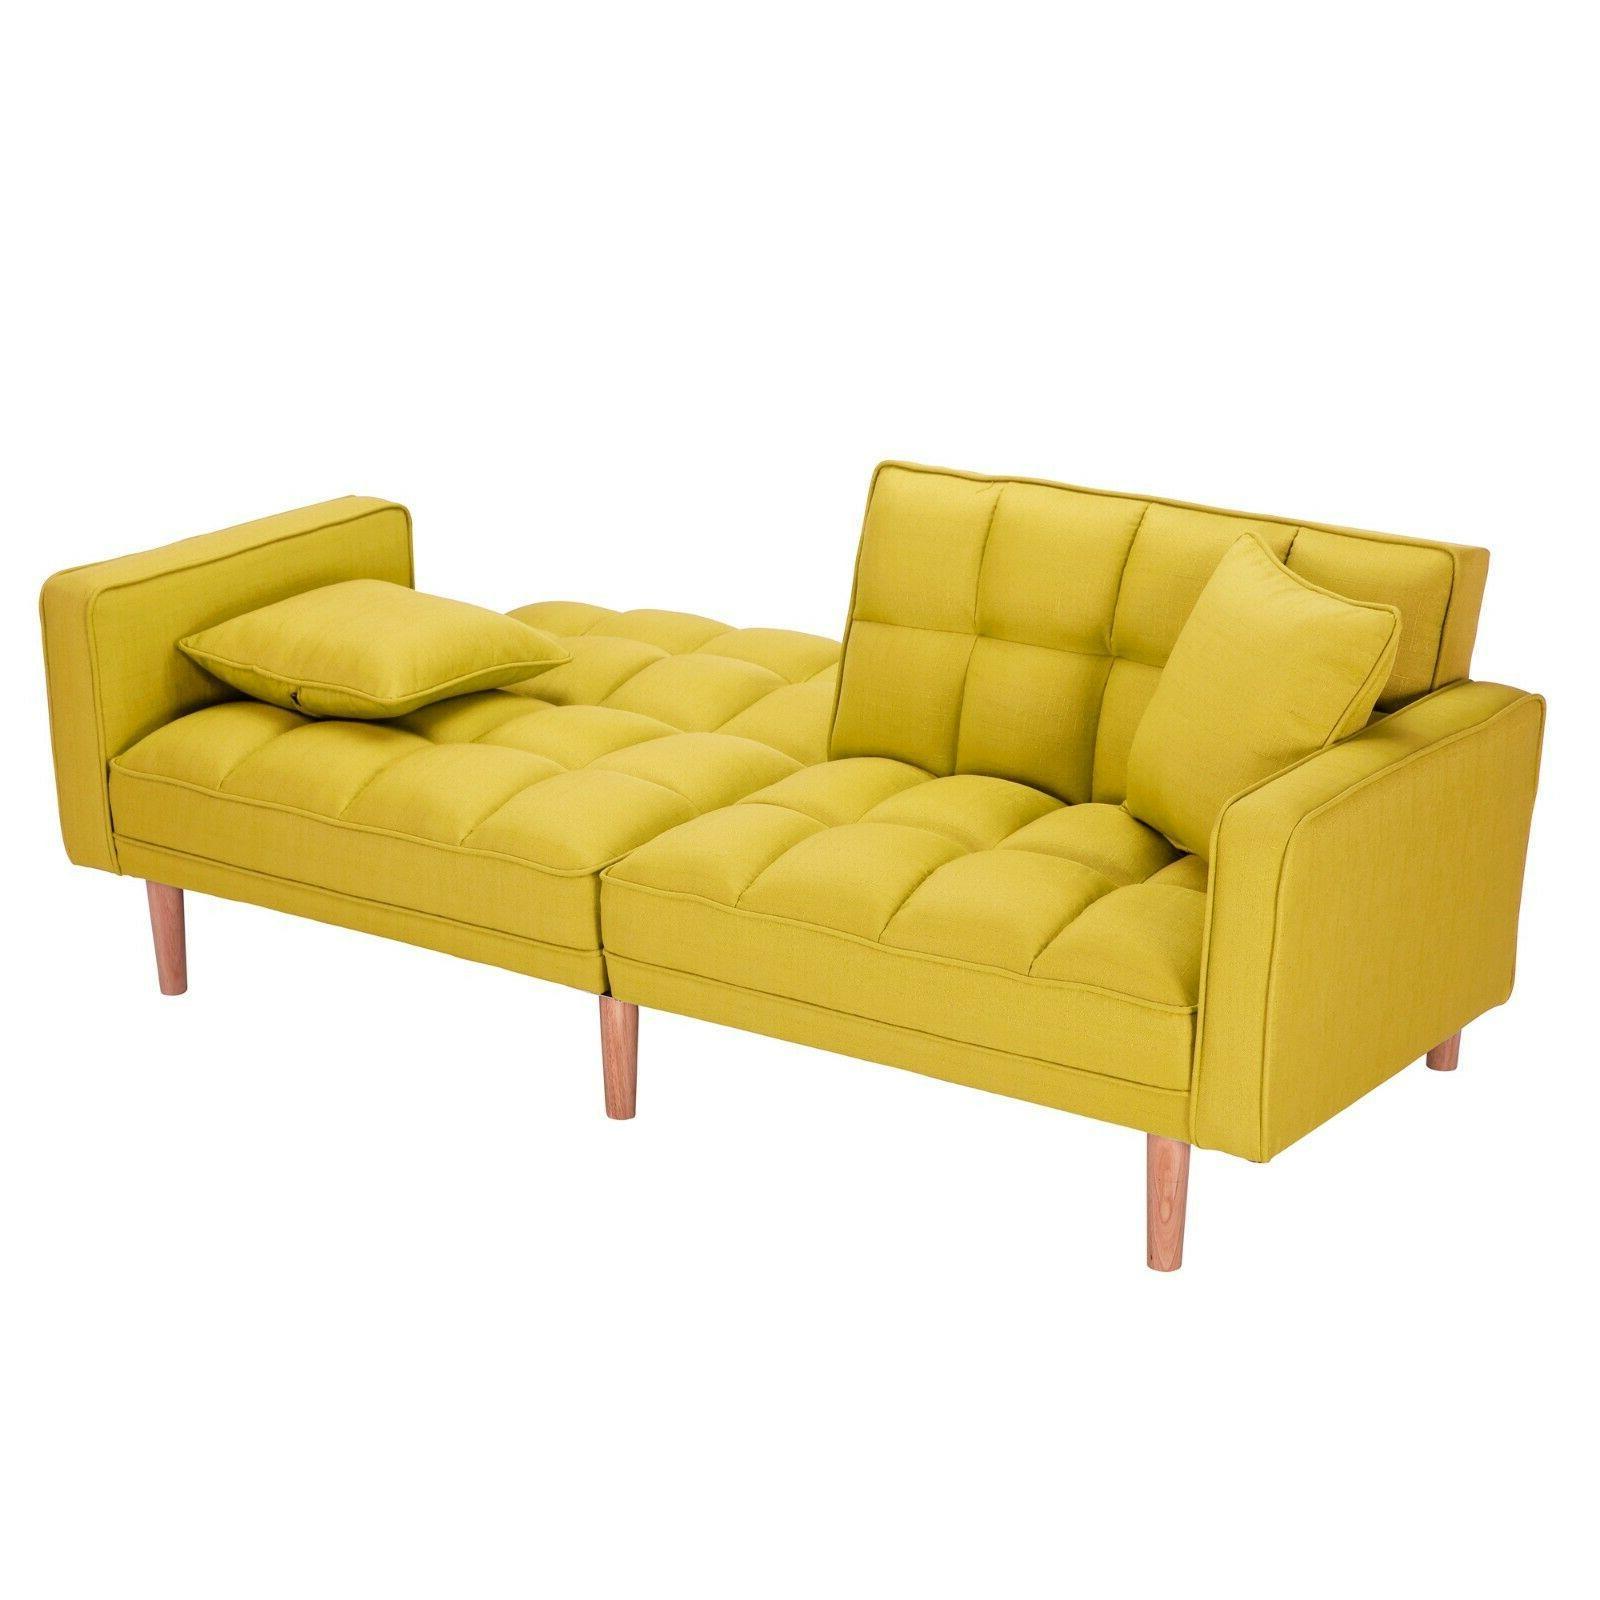 Modern Bed Futon Sofa With 2 Pillows Lounge Sofa USA